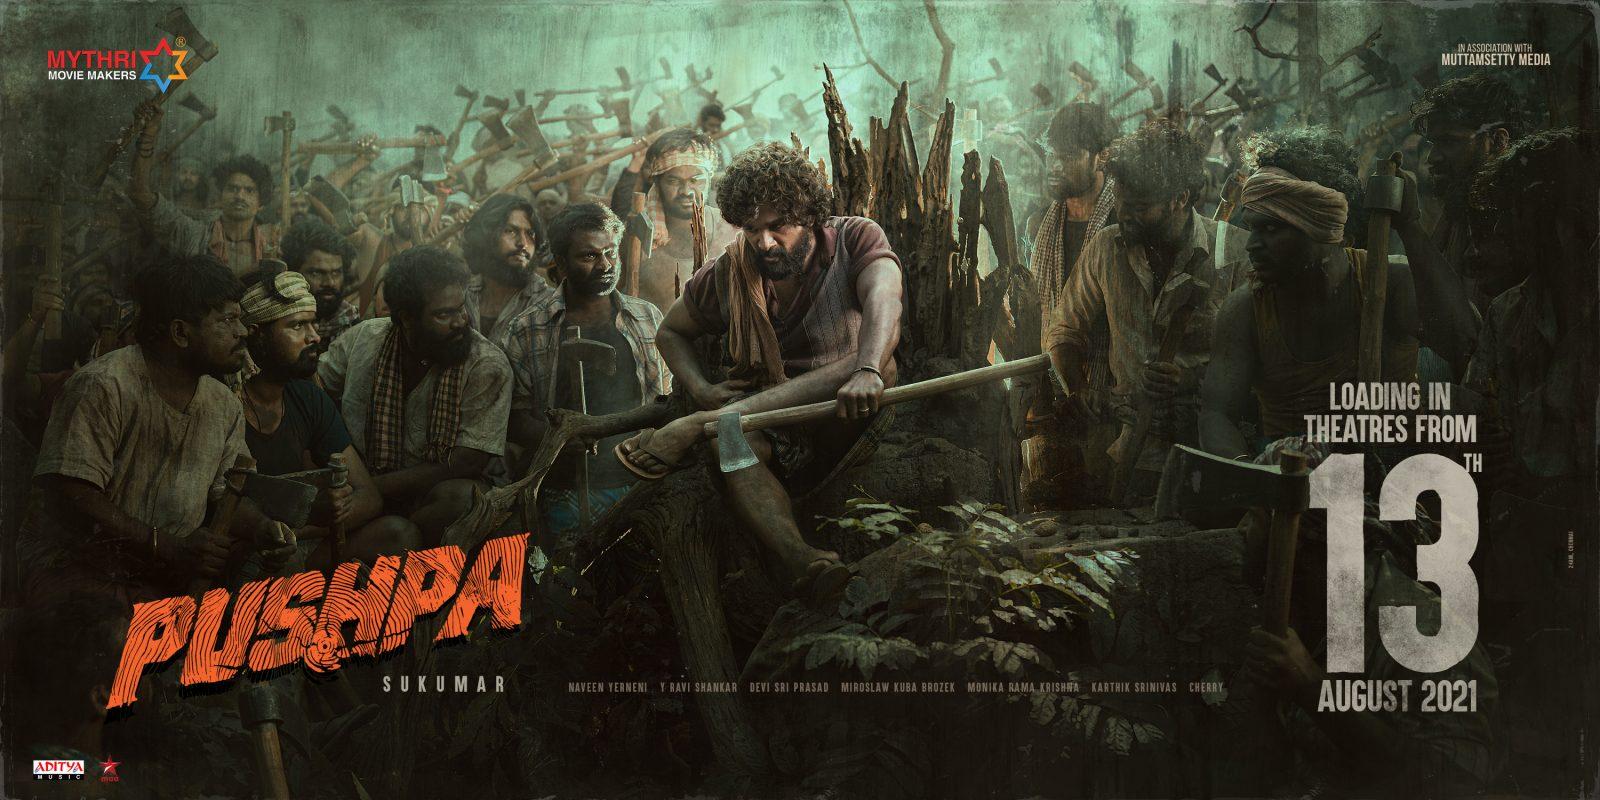 Allu Arjun's Pushpa release date